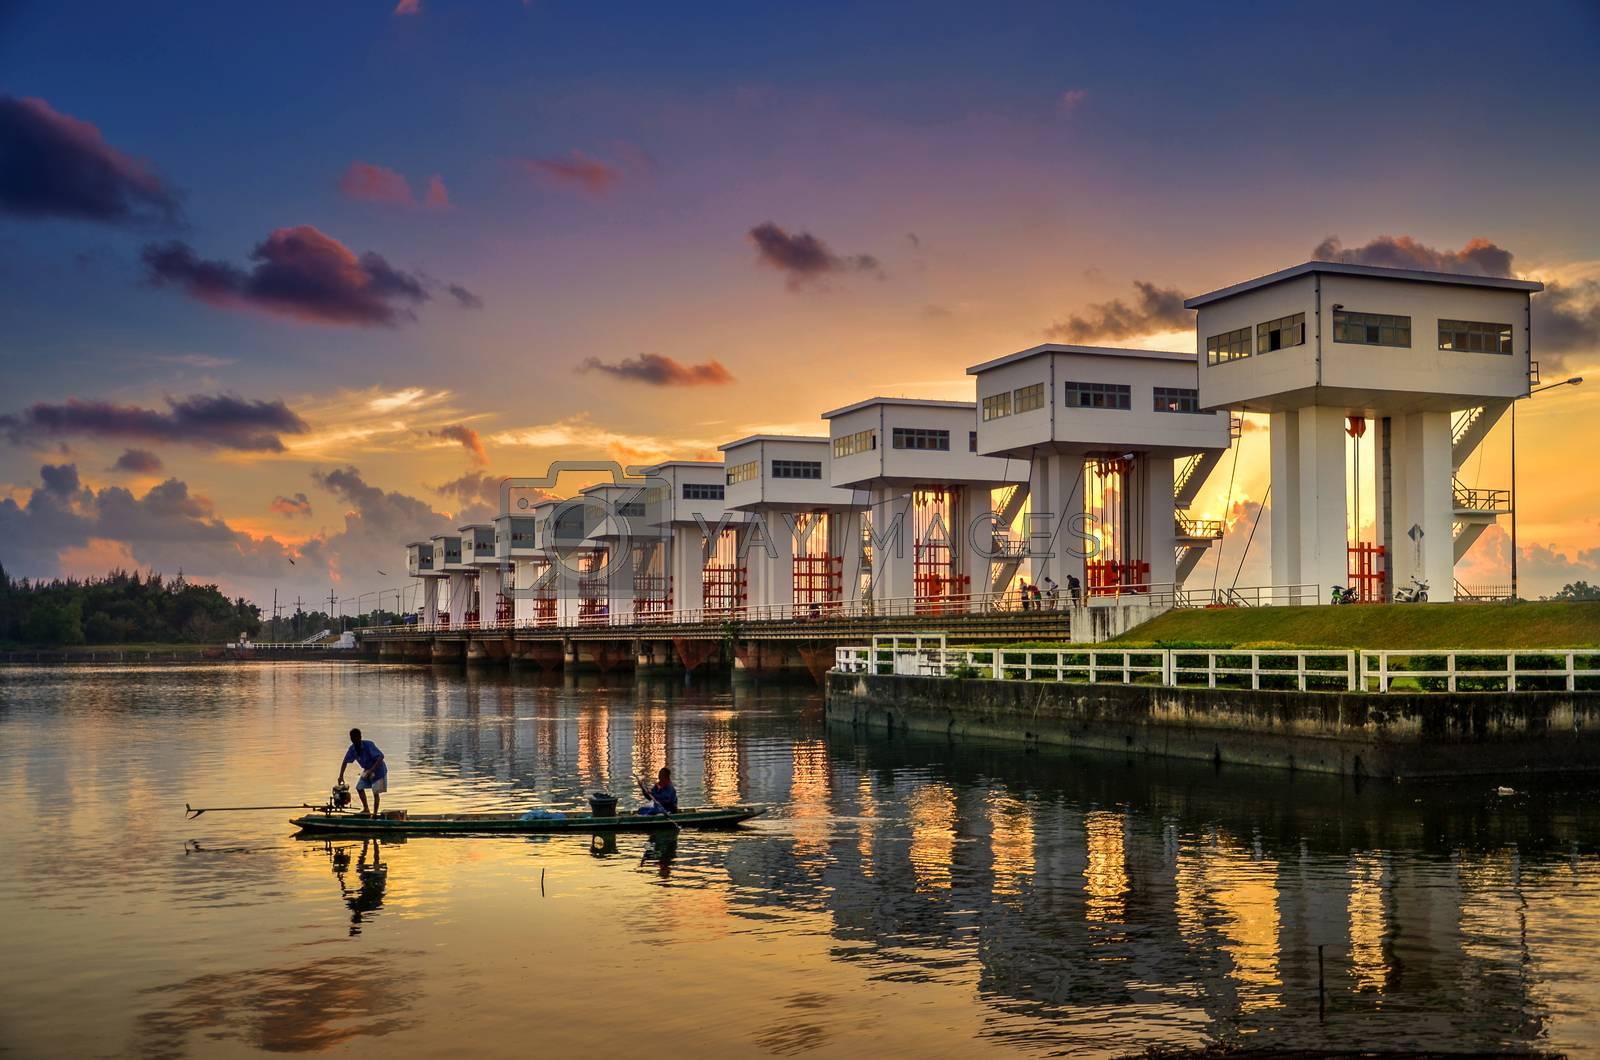 Morning light Utho Wipat prasit floodgates at sunset in pak phanang, nakhon si thammarat, thailand Architecture by Sarayut